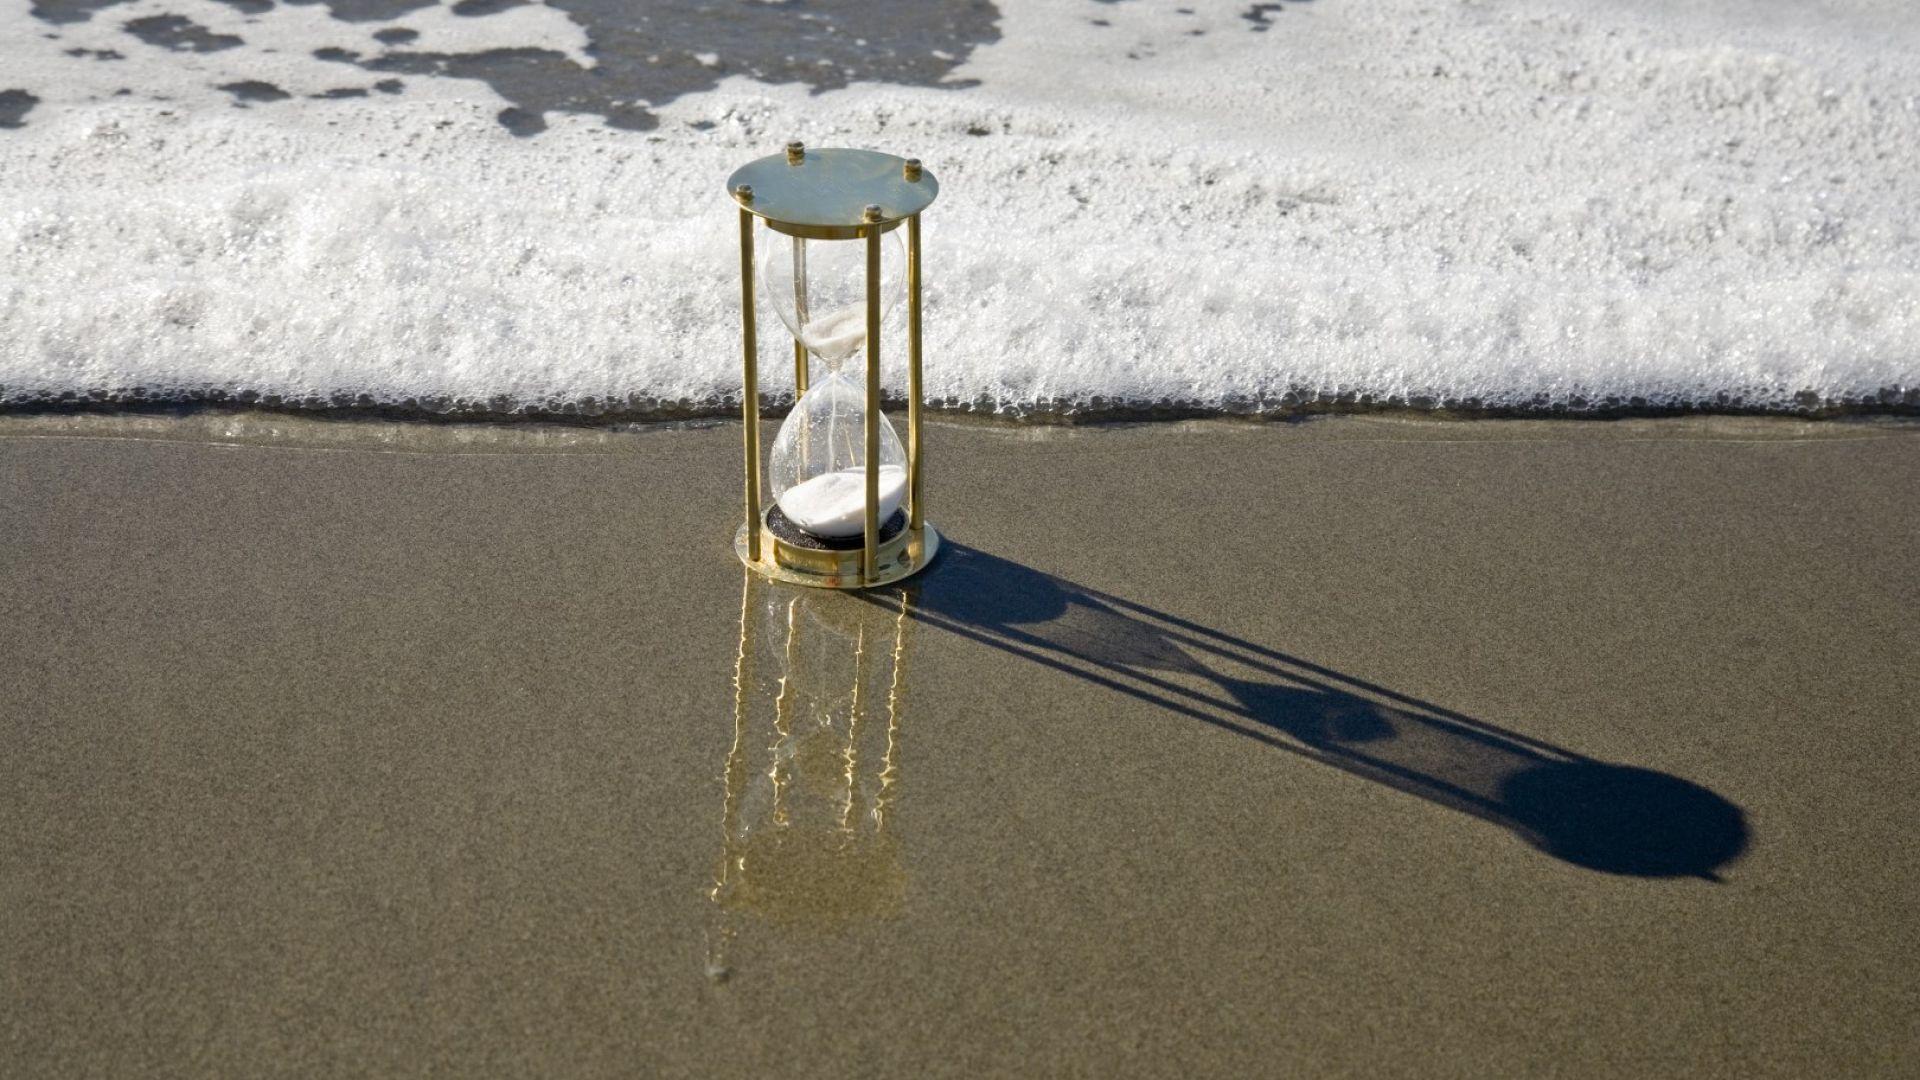 Повишените нива на океаните непосредствено застрашават 300 000 000 души